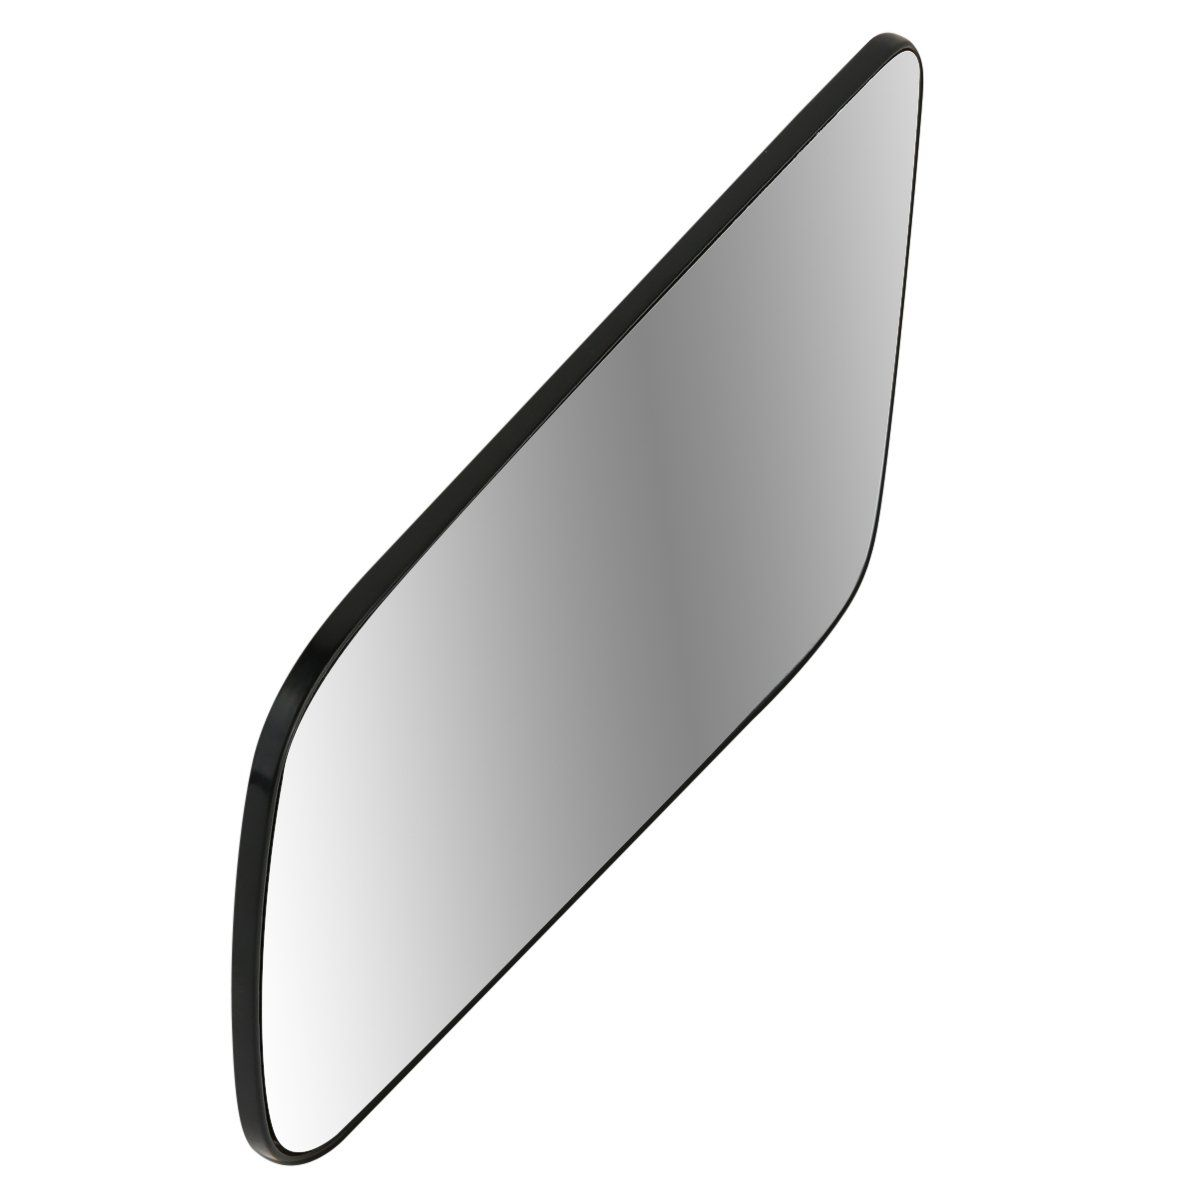 08 11 Ford Focus Left Driver Side Door Mirror Glass 8s4z17k707c In 2021 Glass Mirror Mirror House Mirror Door